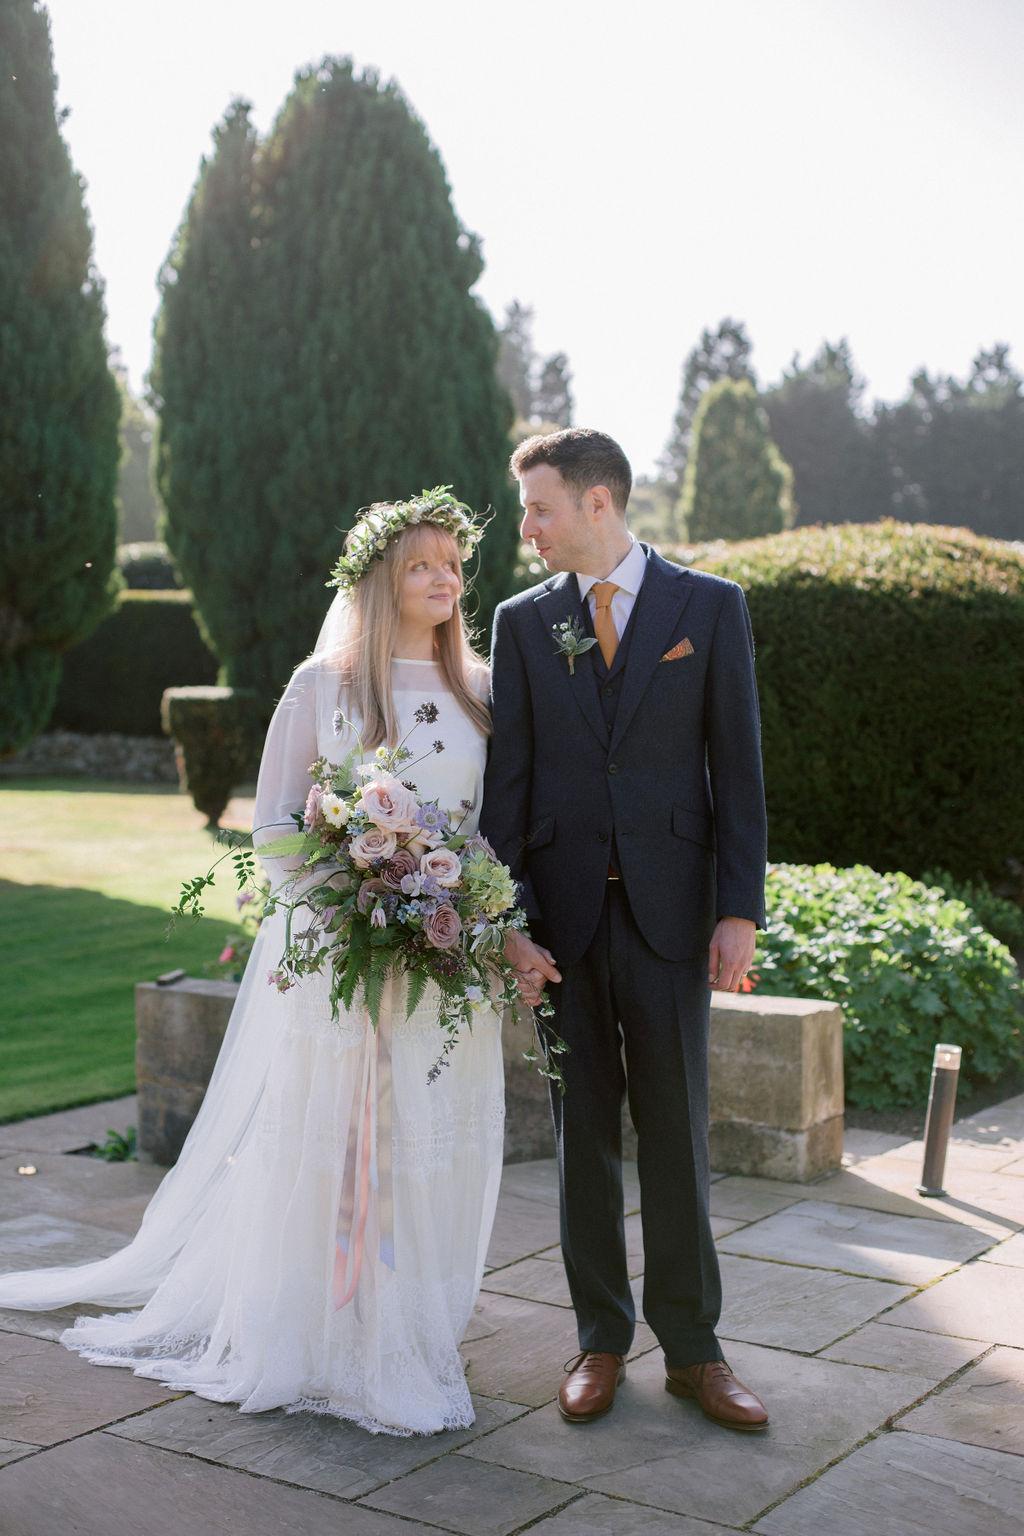 Gilmerton House Wedding - Narcissus Flowers wedding bouquet